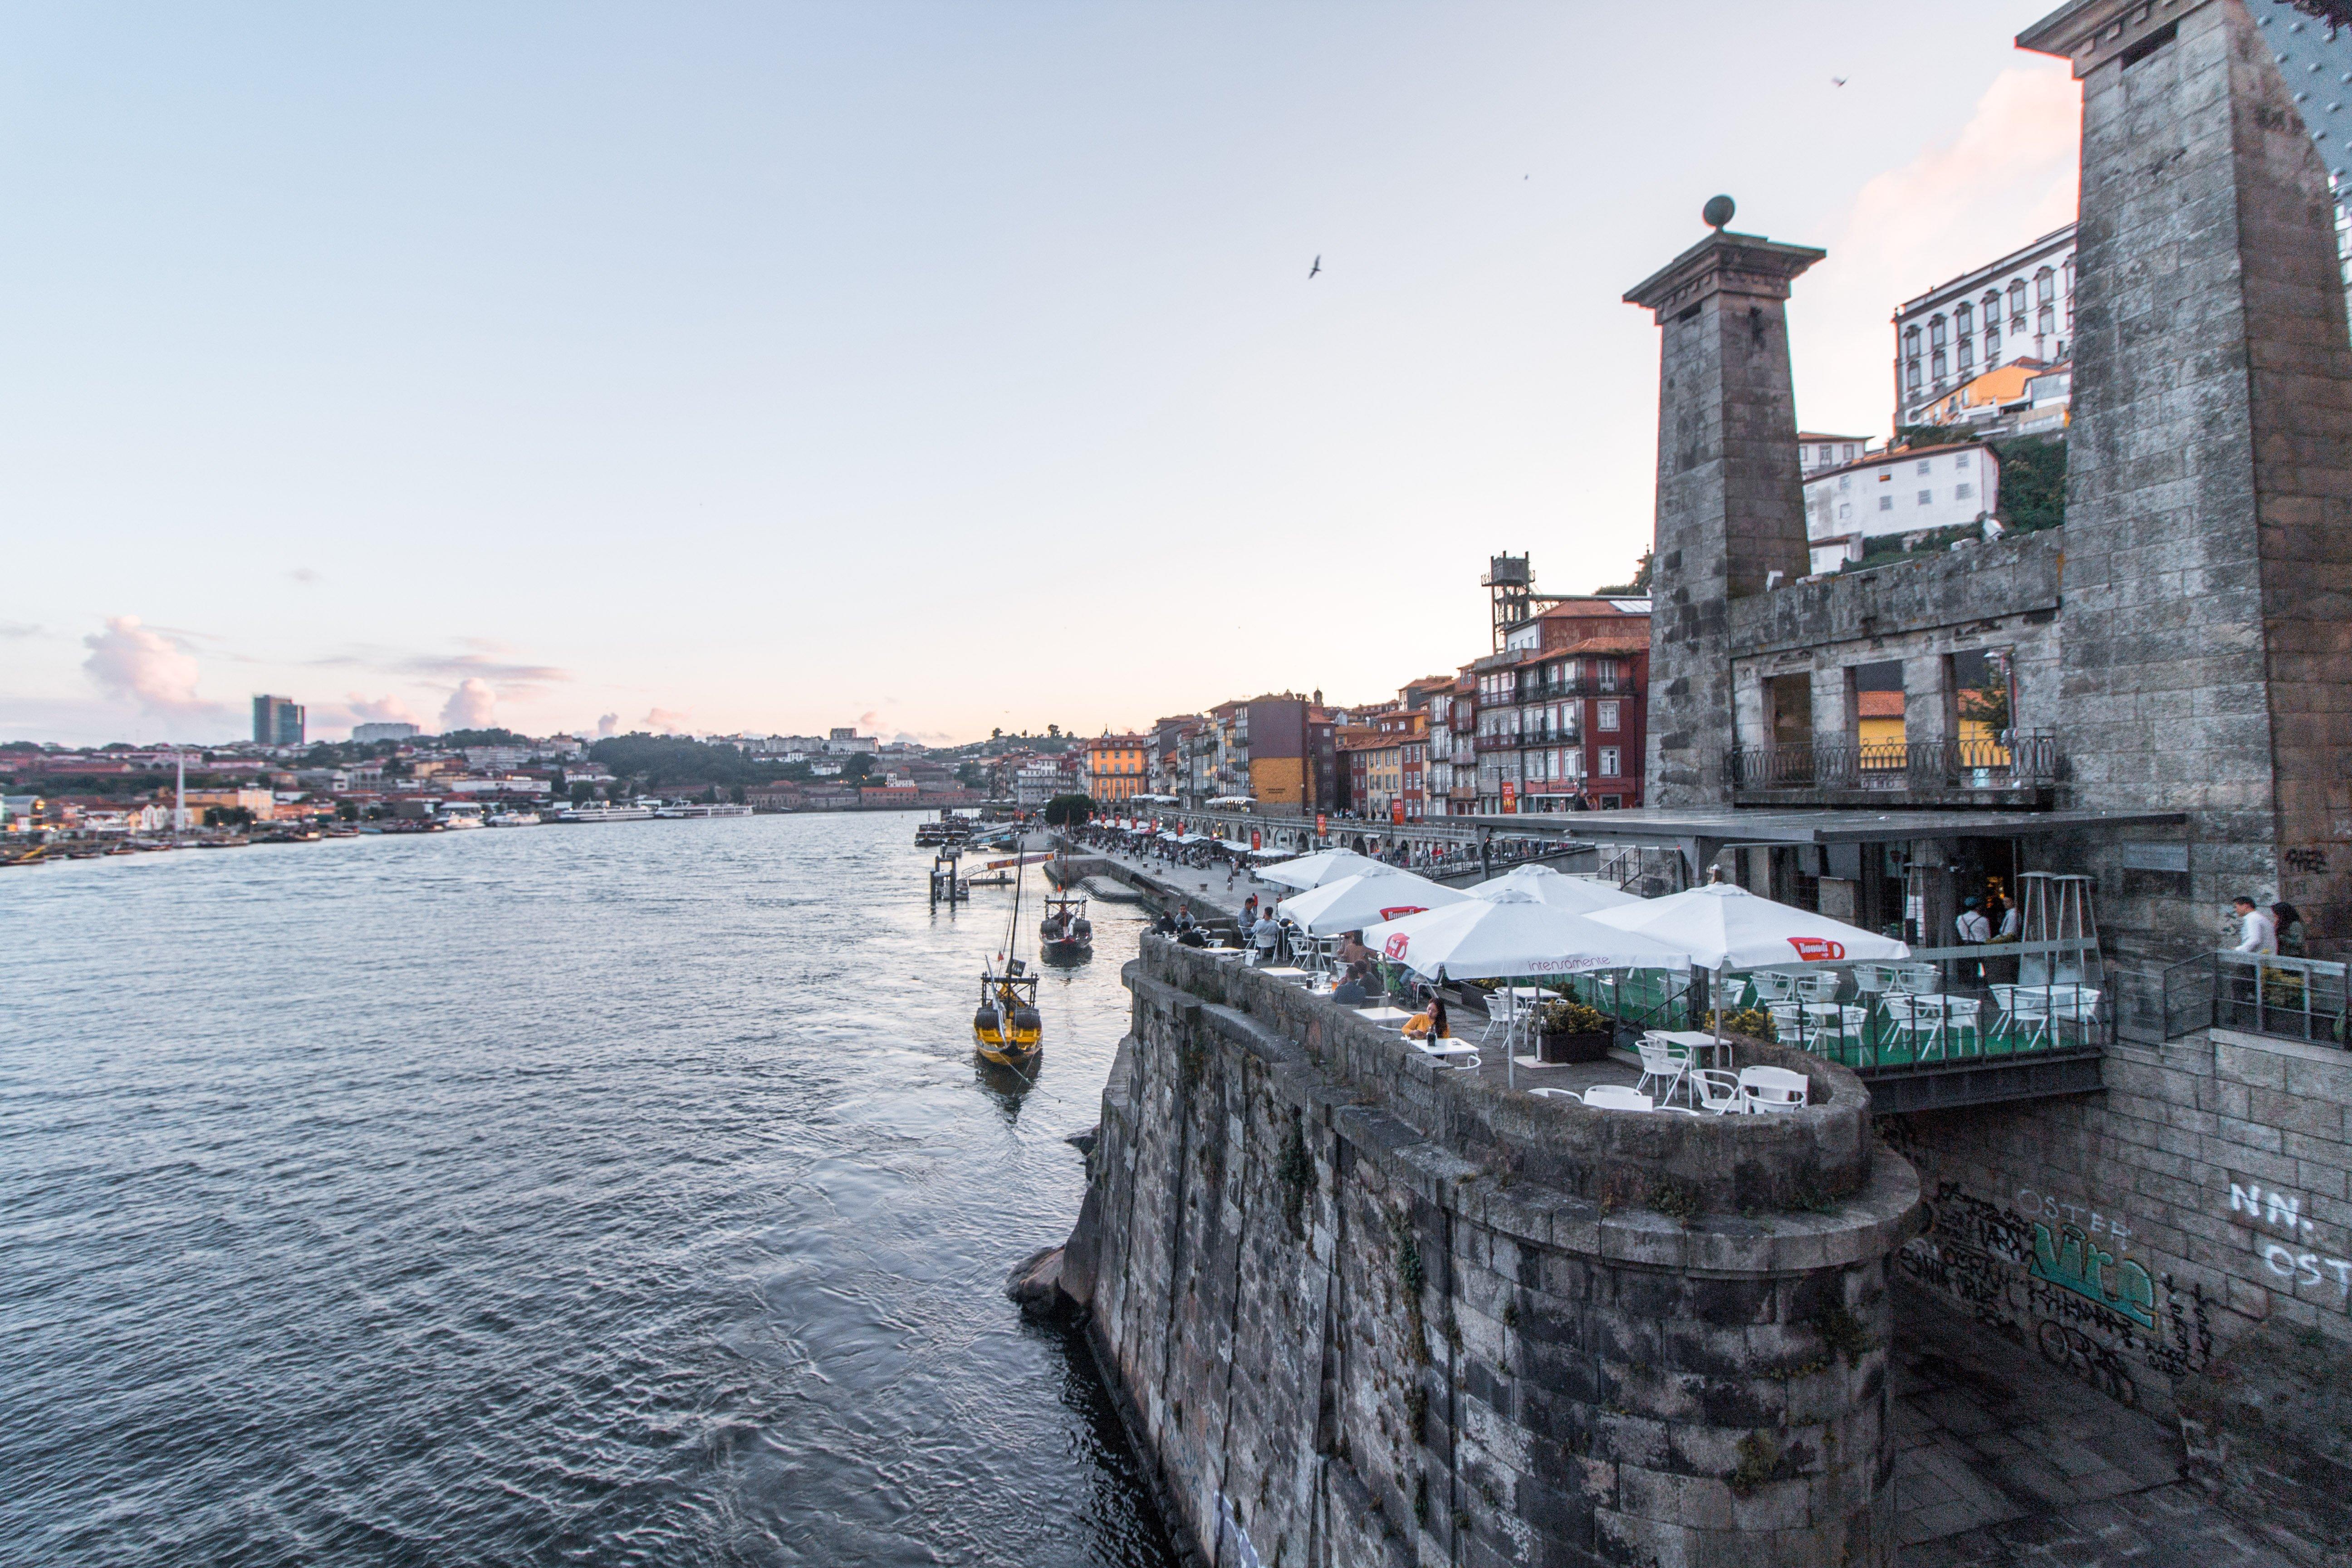 porto restaurants by the river douro